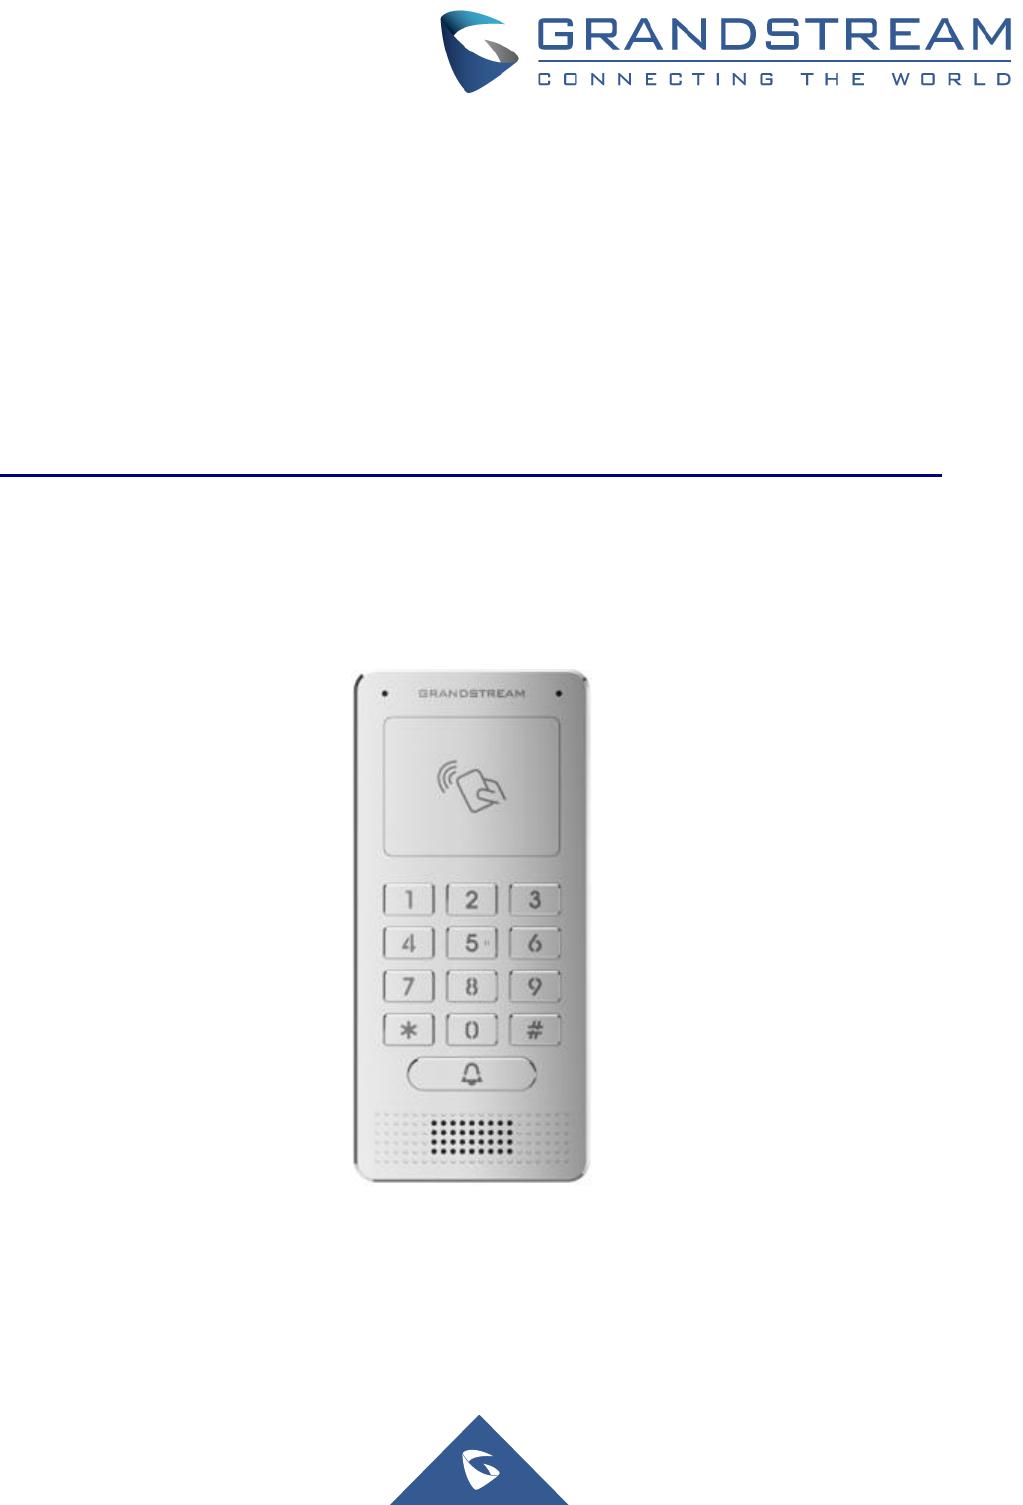 Grandstream Networks GDS3705 IP Audio Door System User Manual